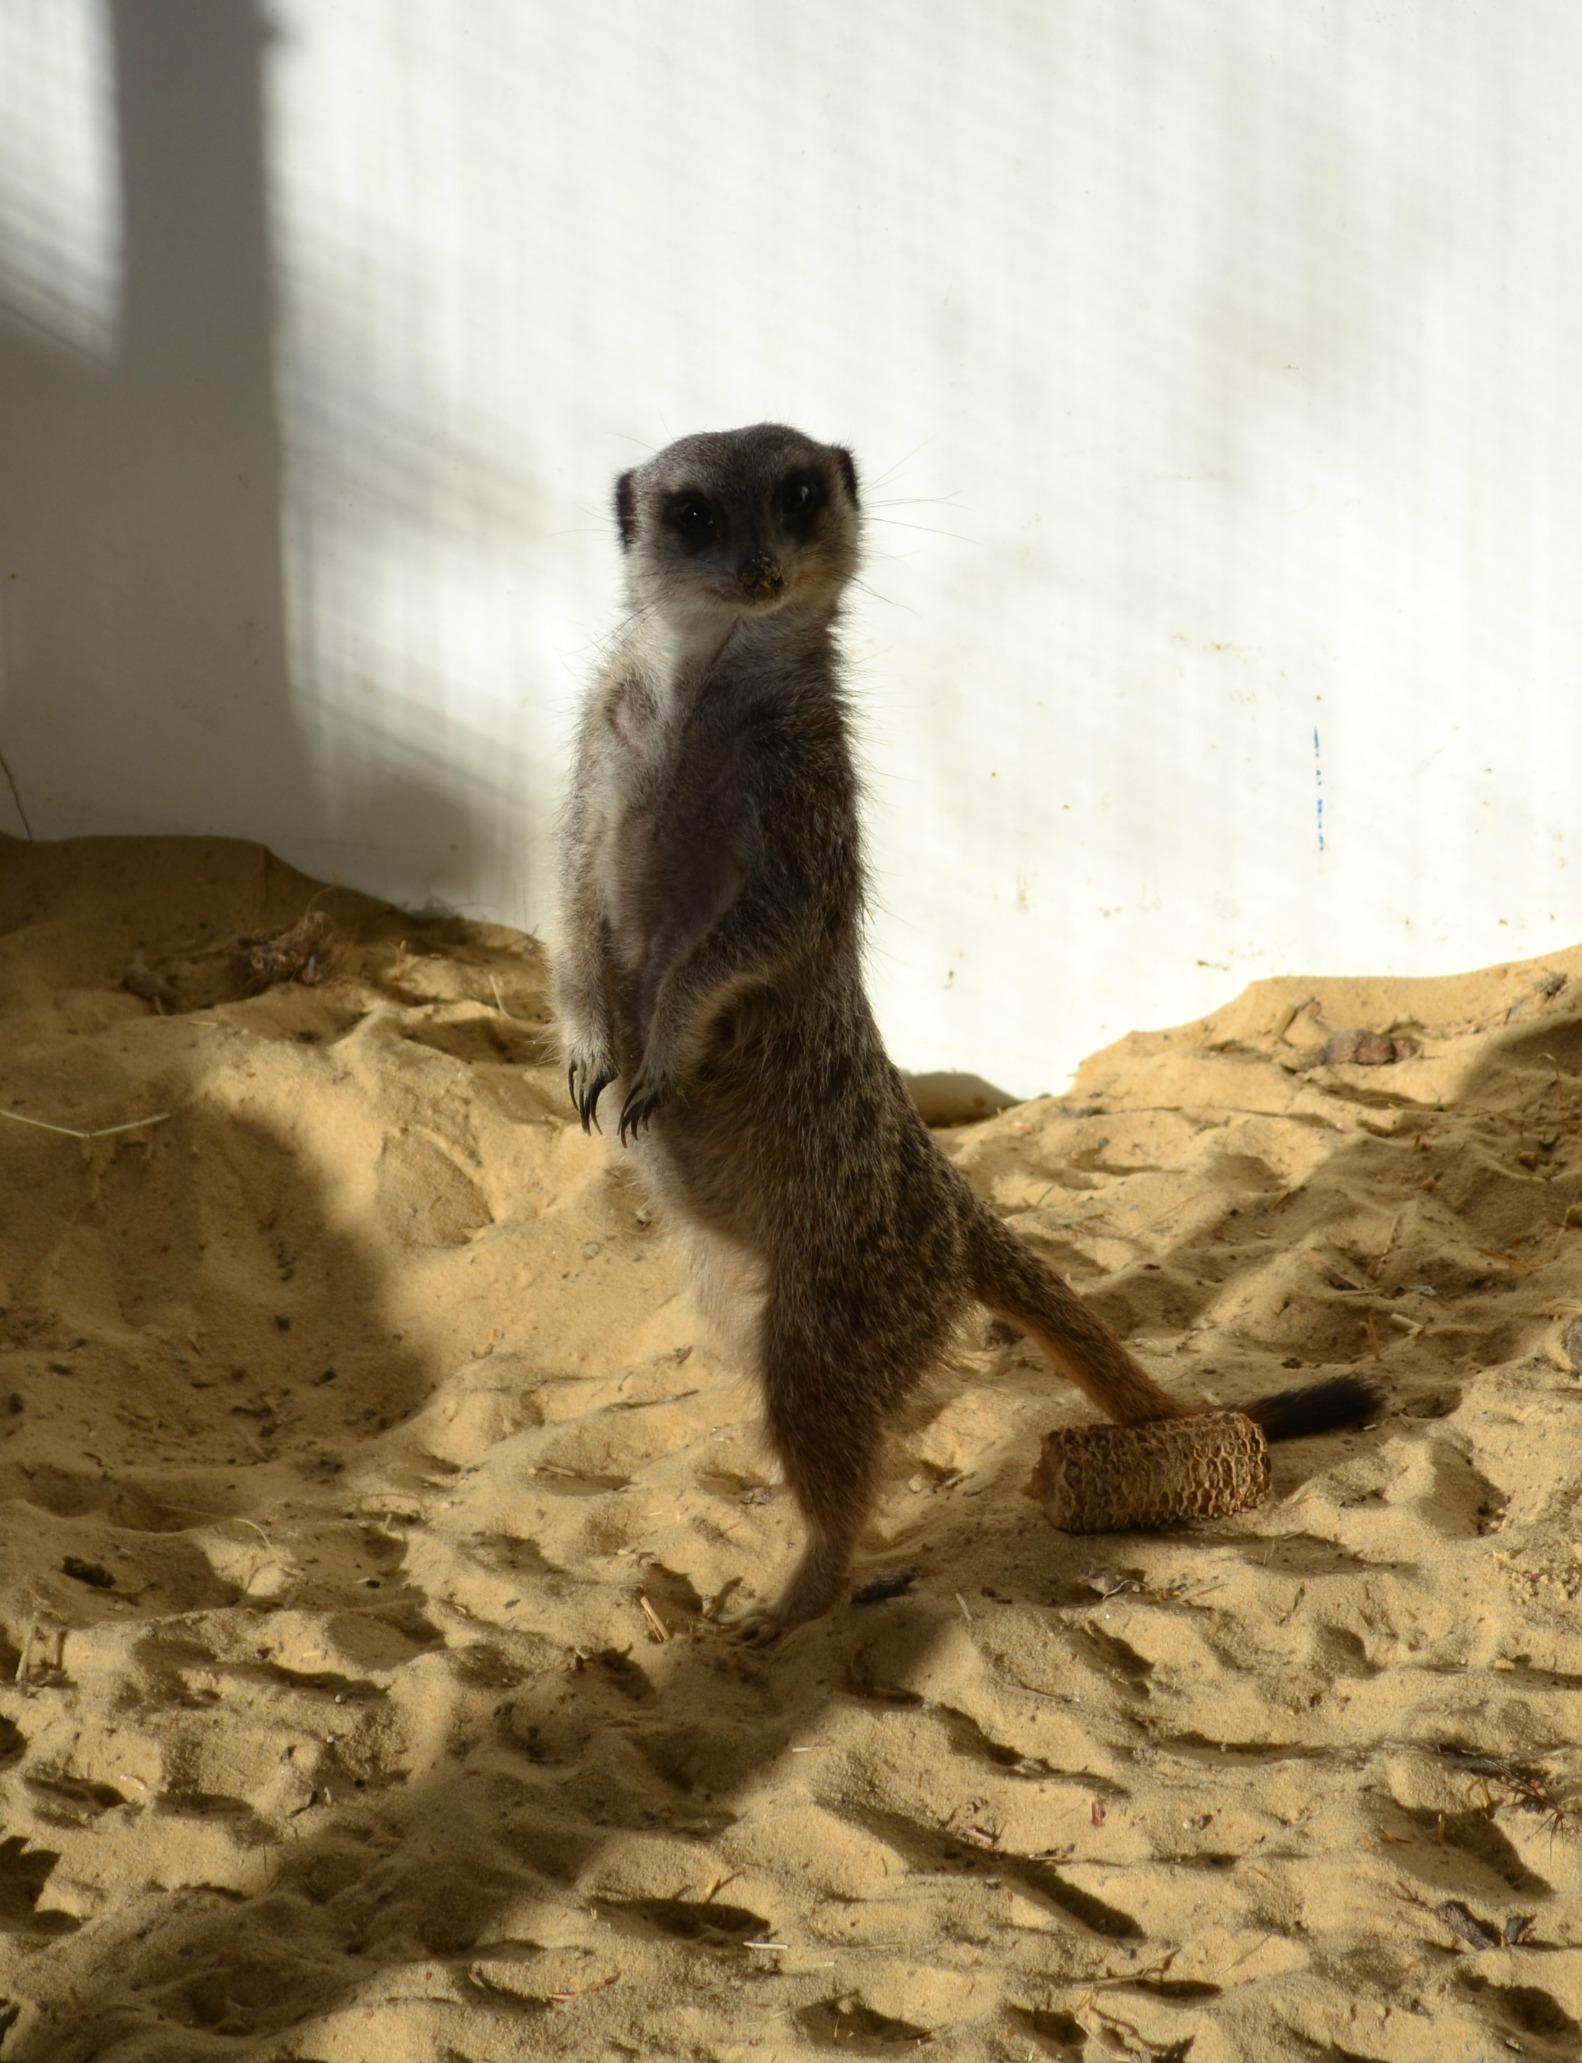 Miles the Meerkat